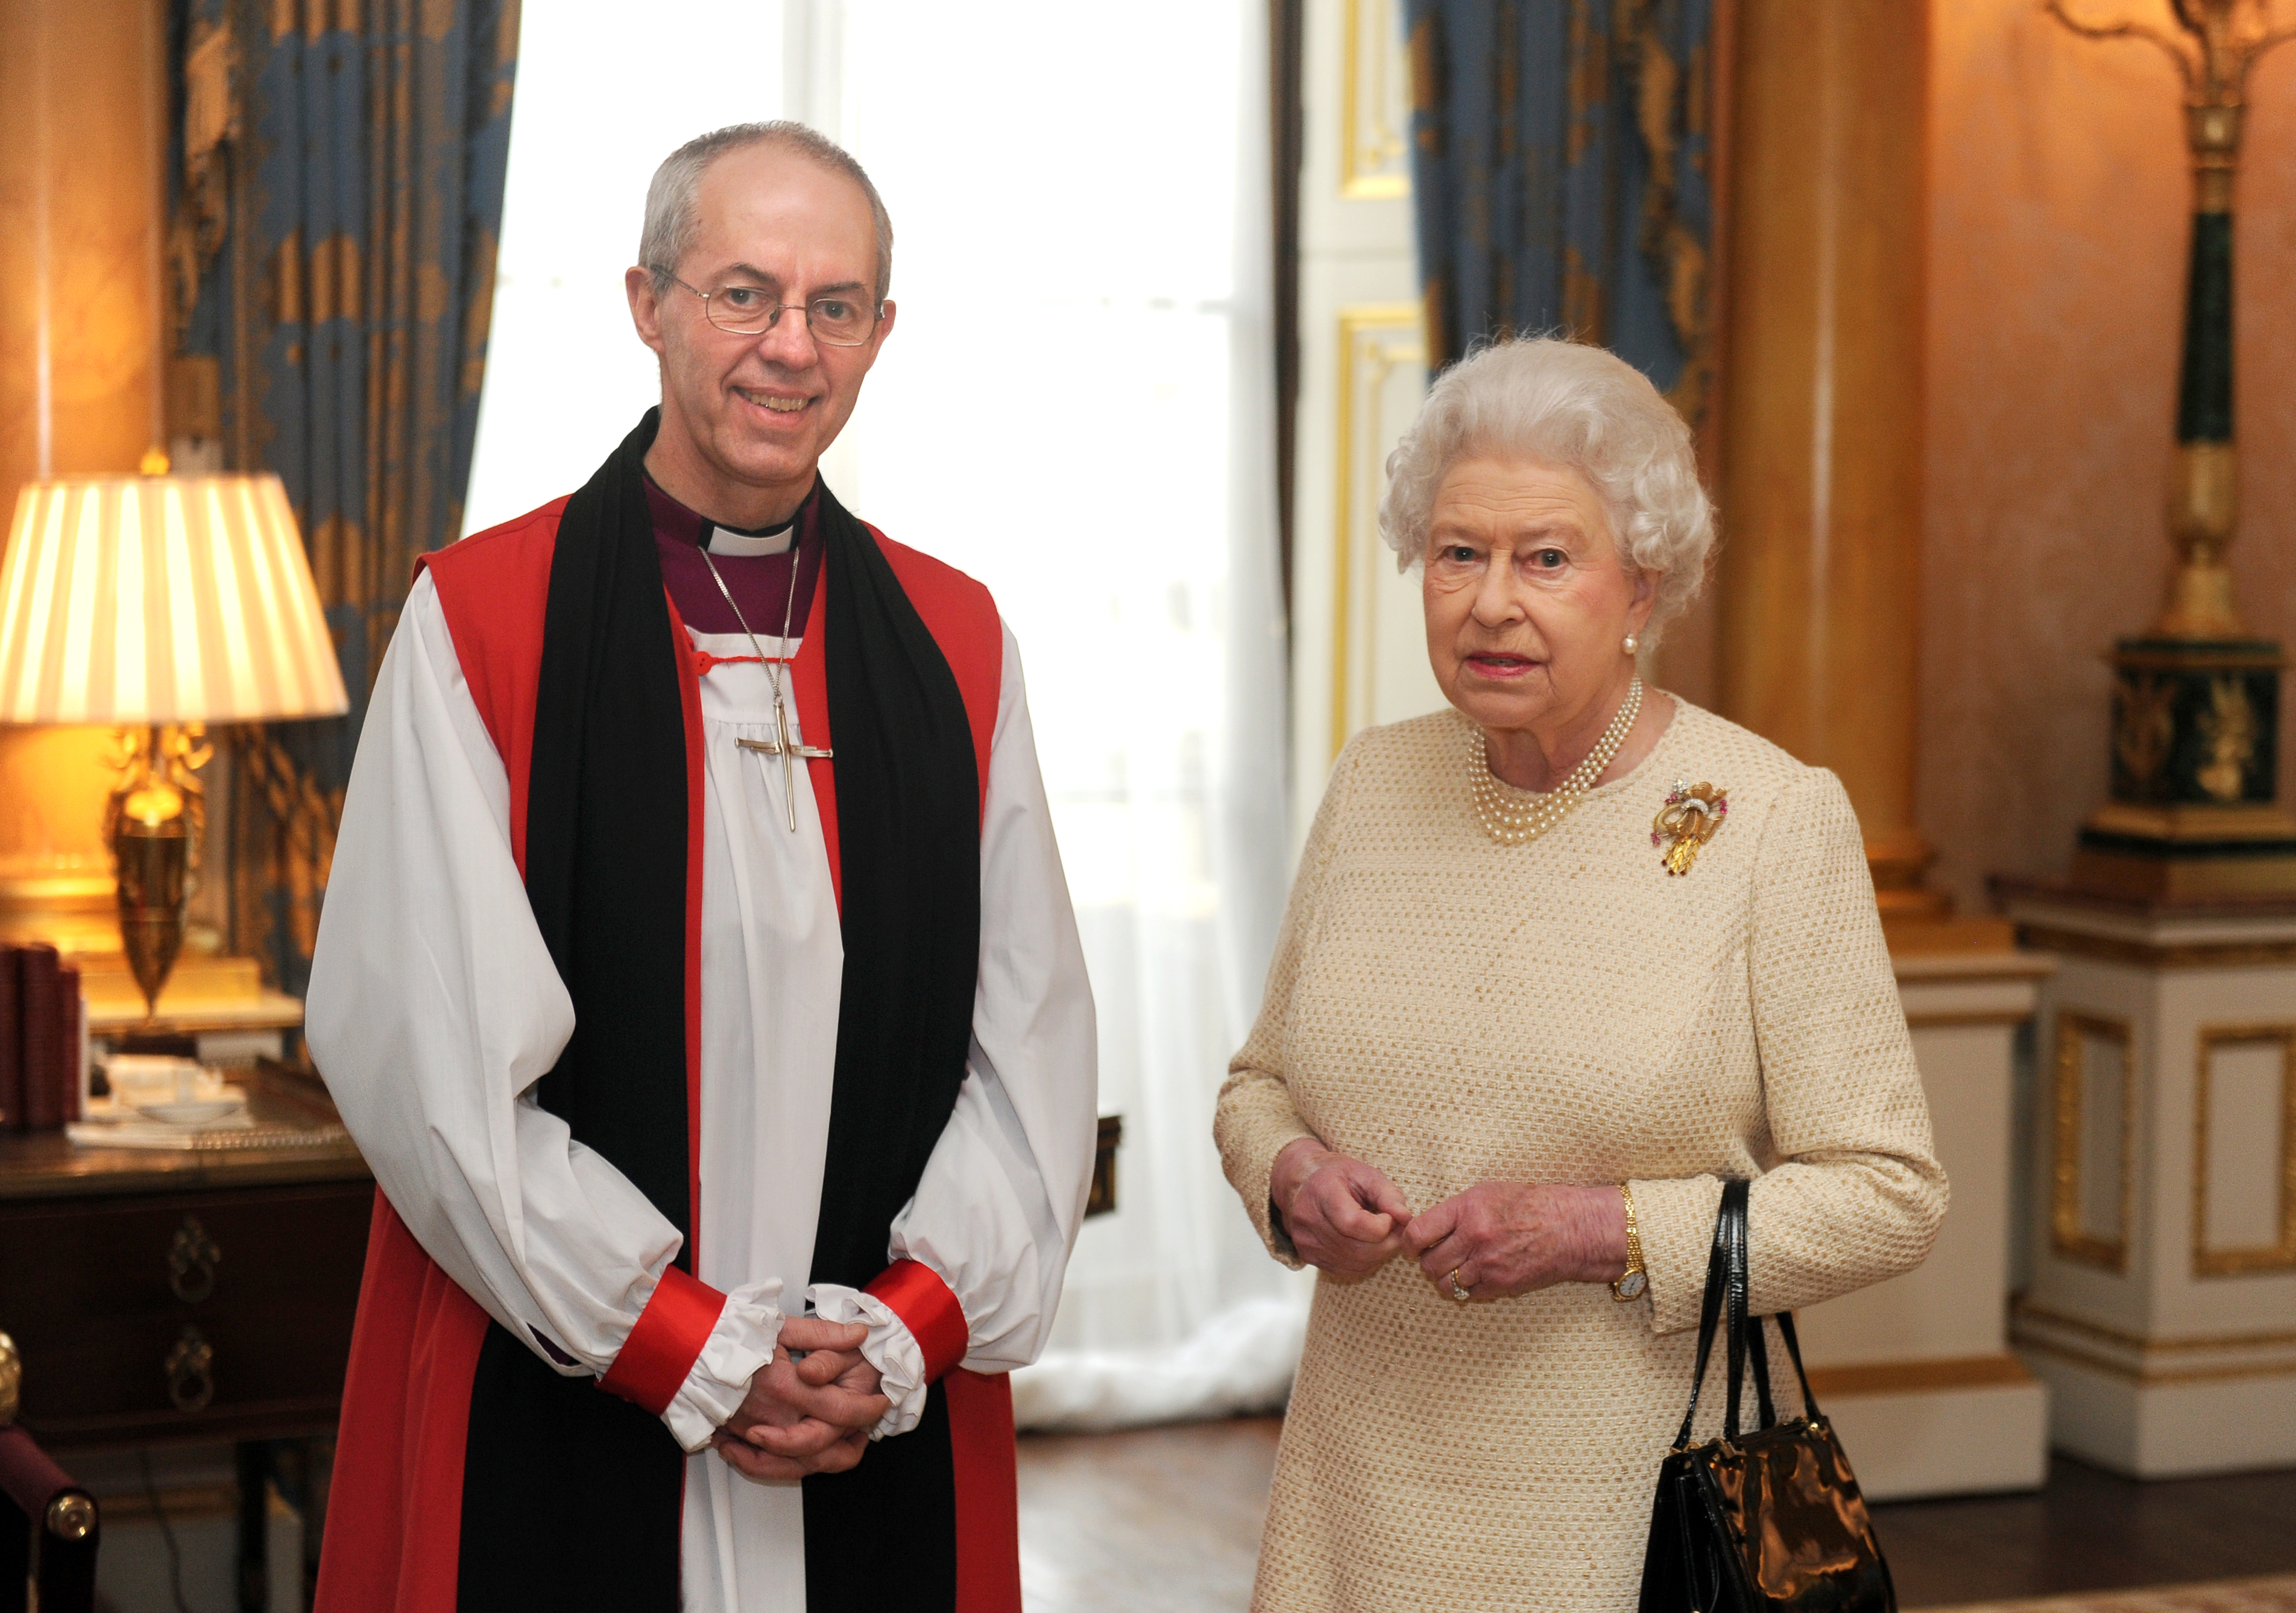 Rainha Elizabeth II, líder da Igreja Anglicana